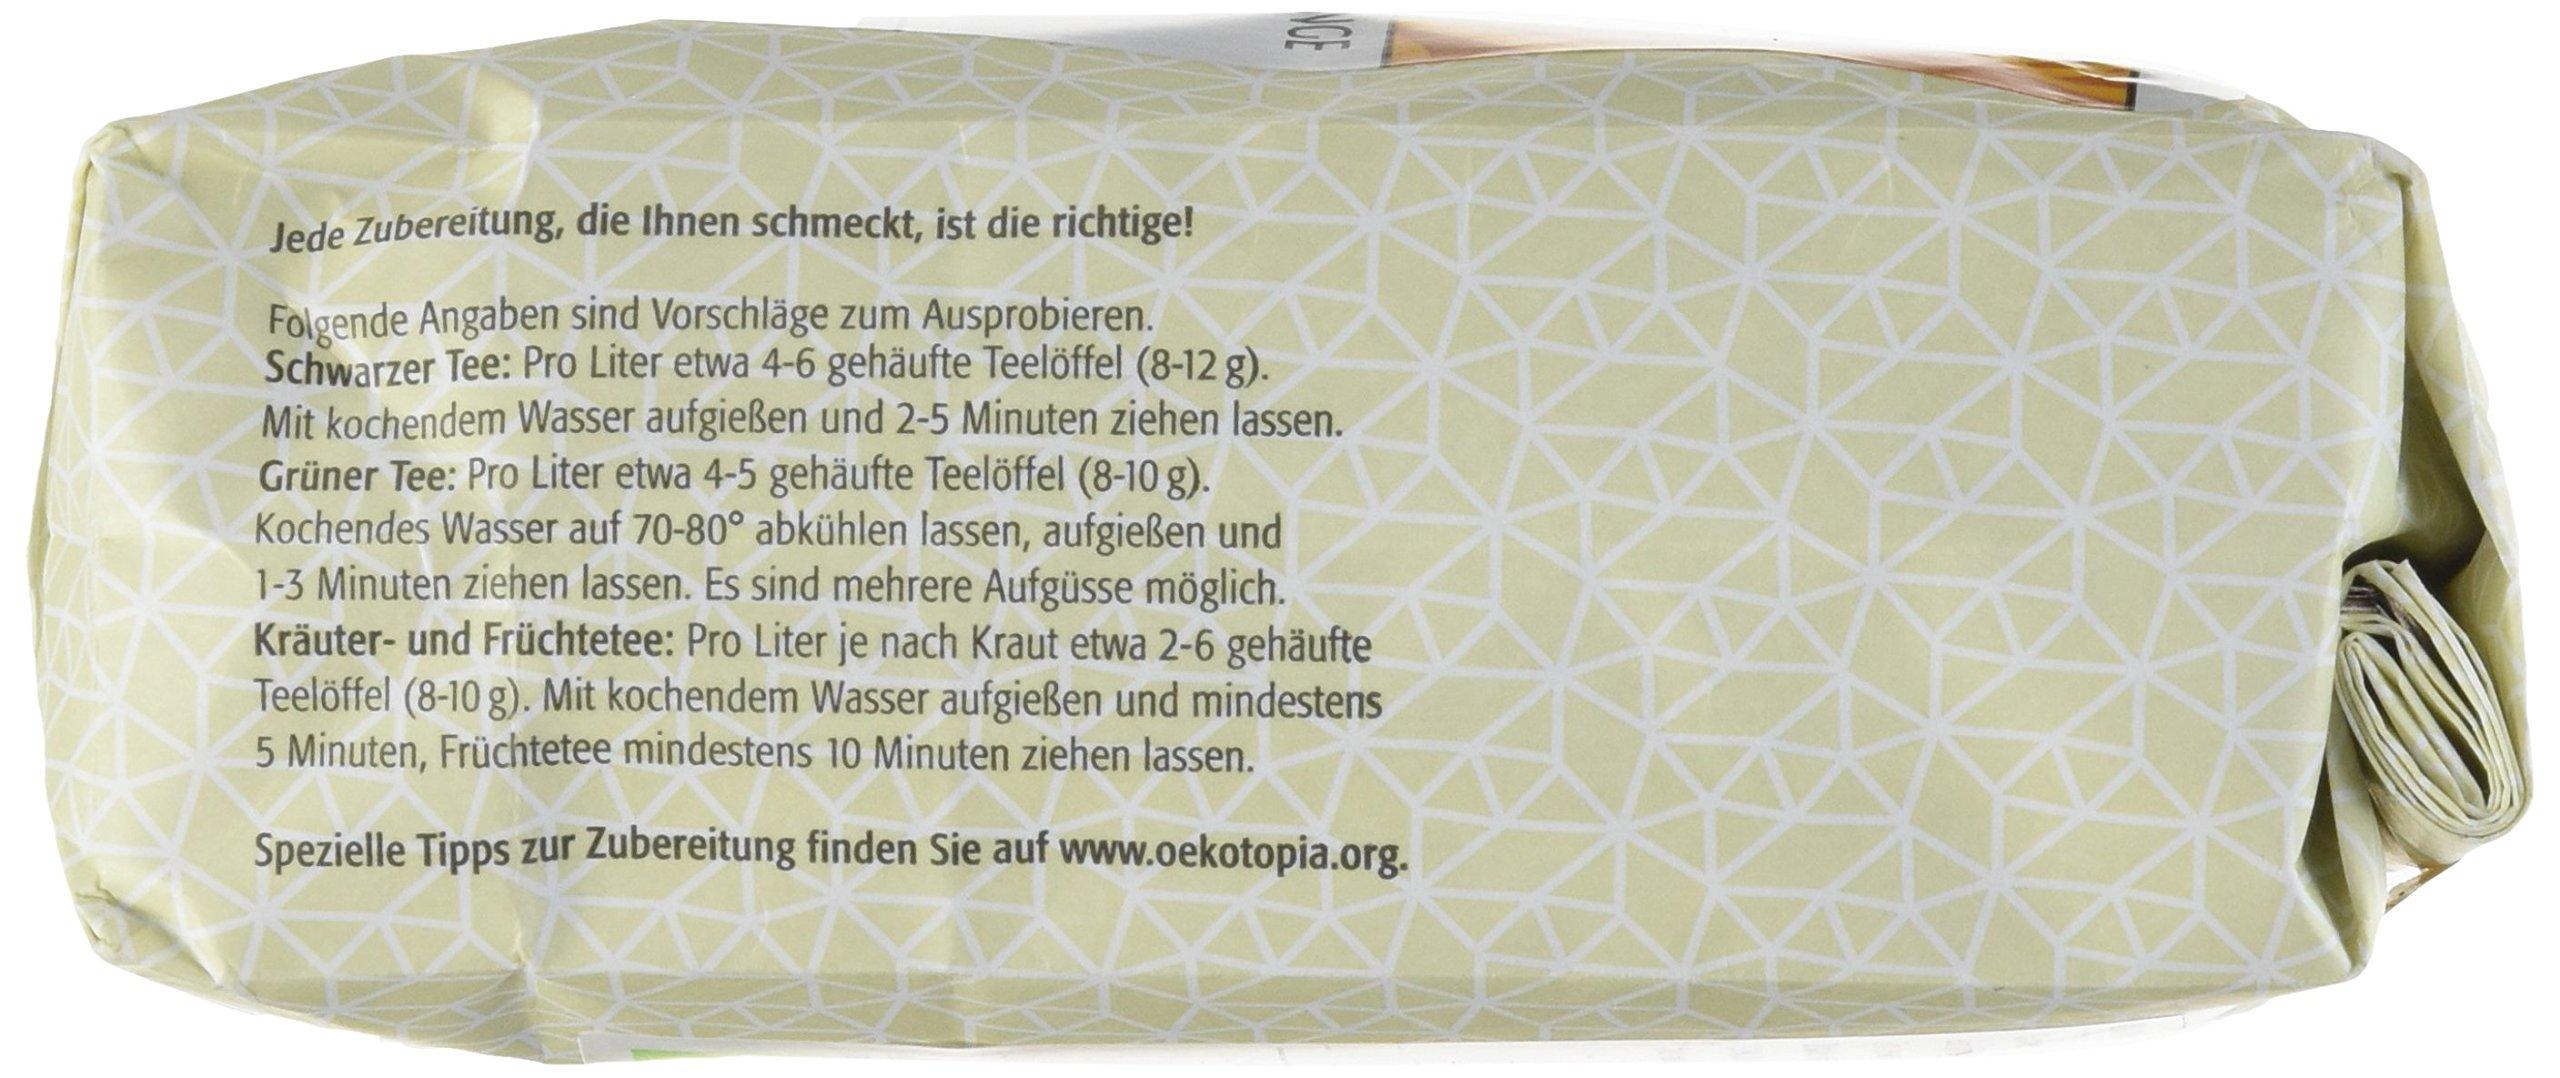 kotopia-Roibusch-Tee-aromatisiert-Rooibush-Orange-1er-Pack-1-x-250-g